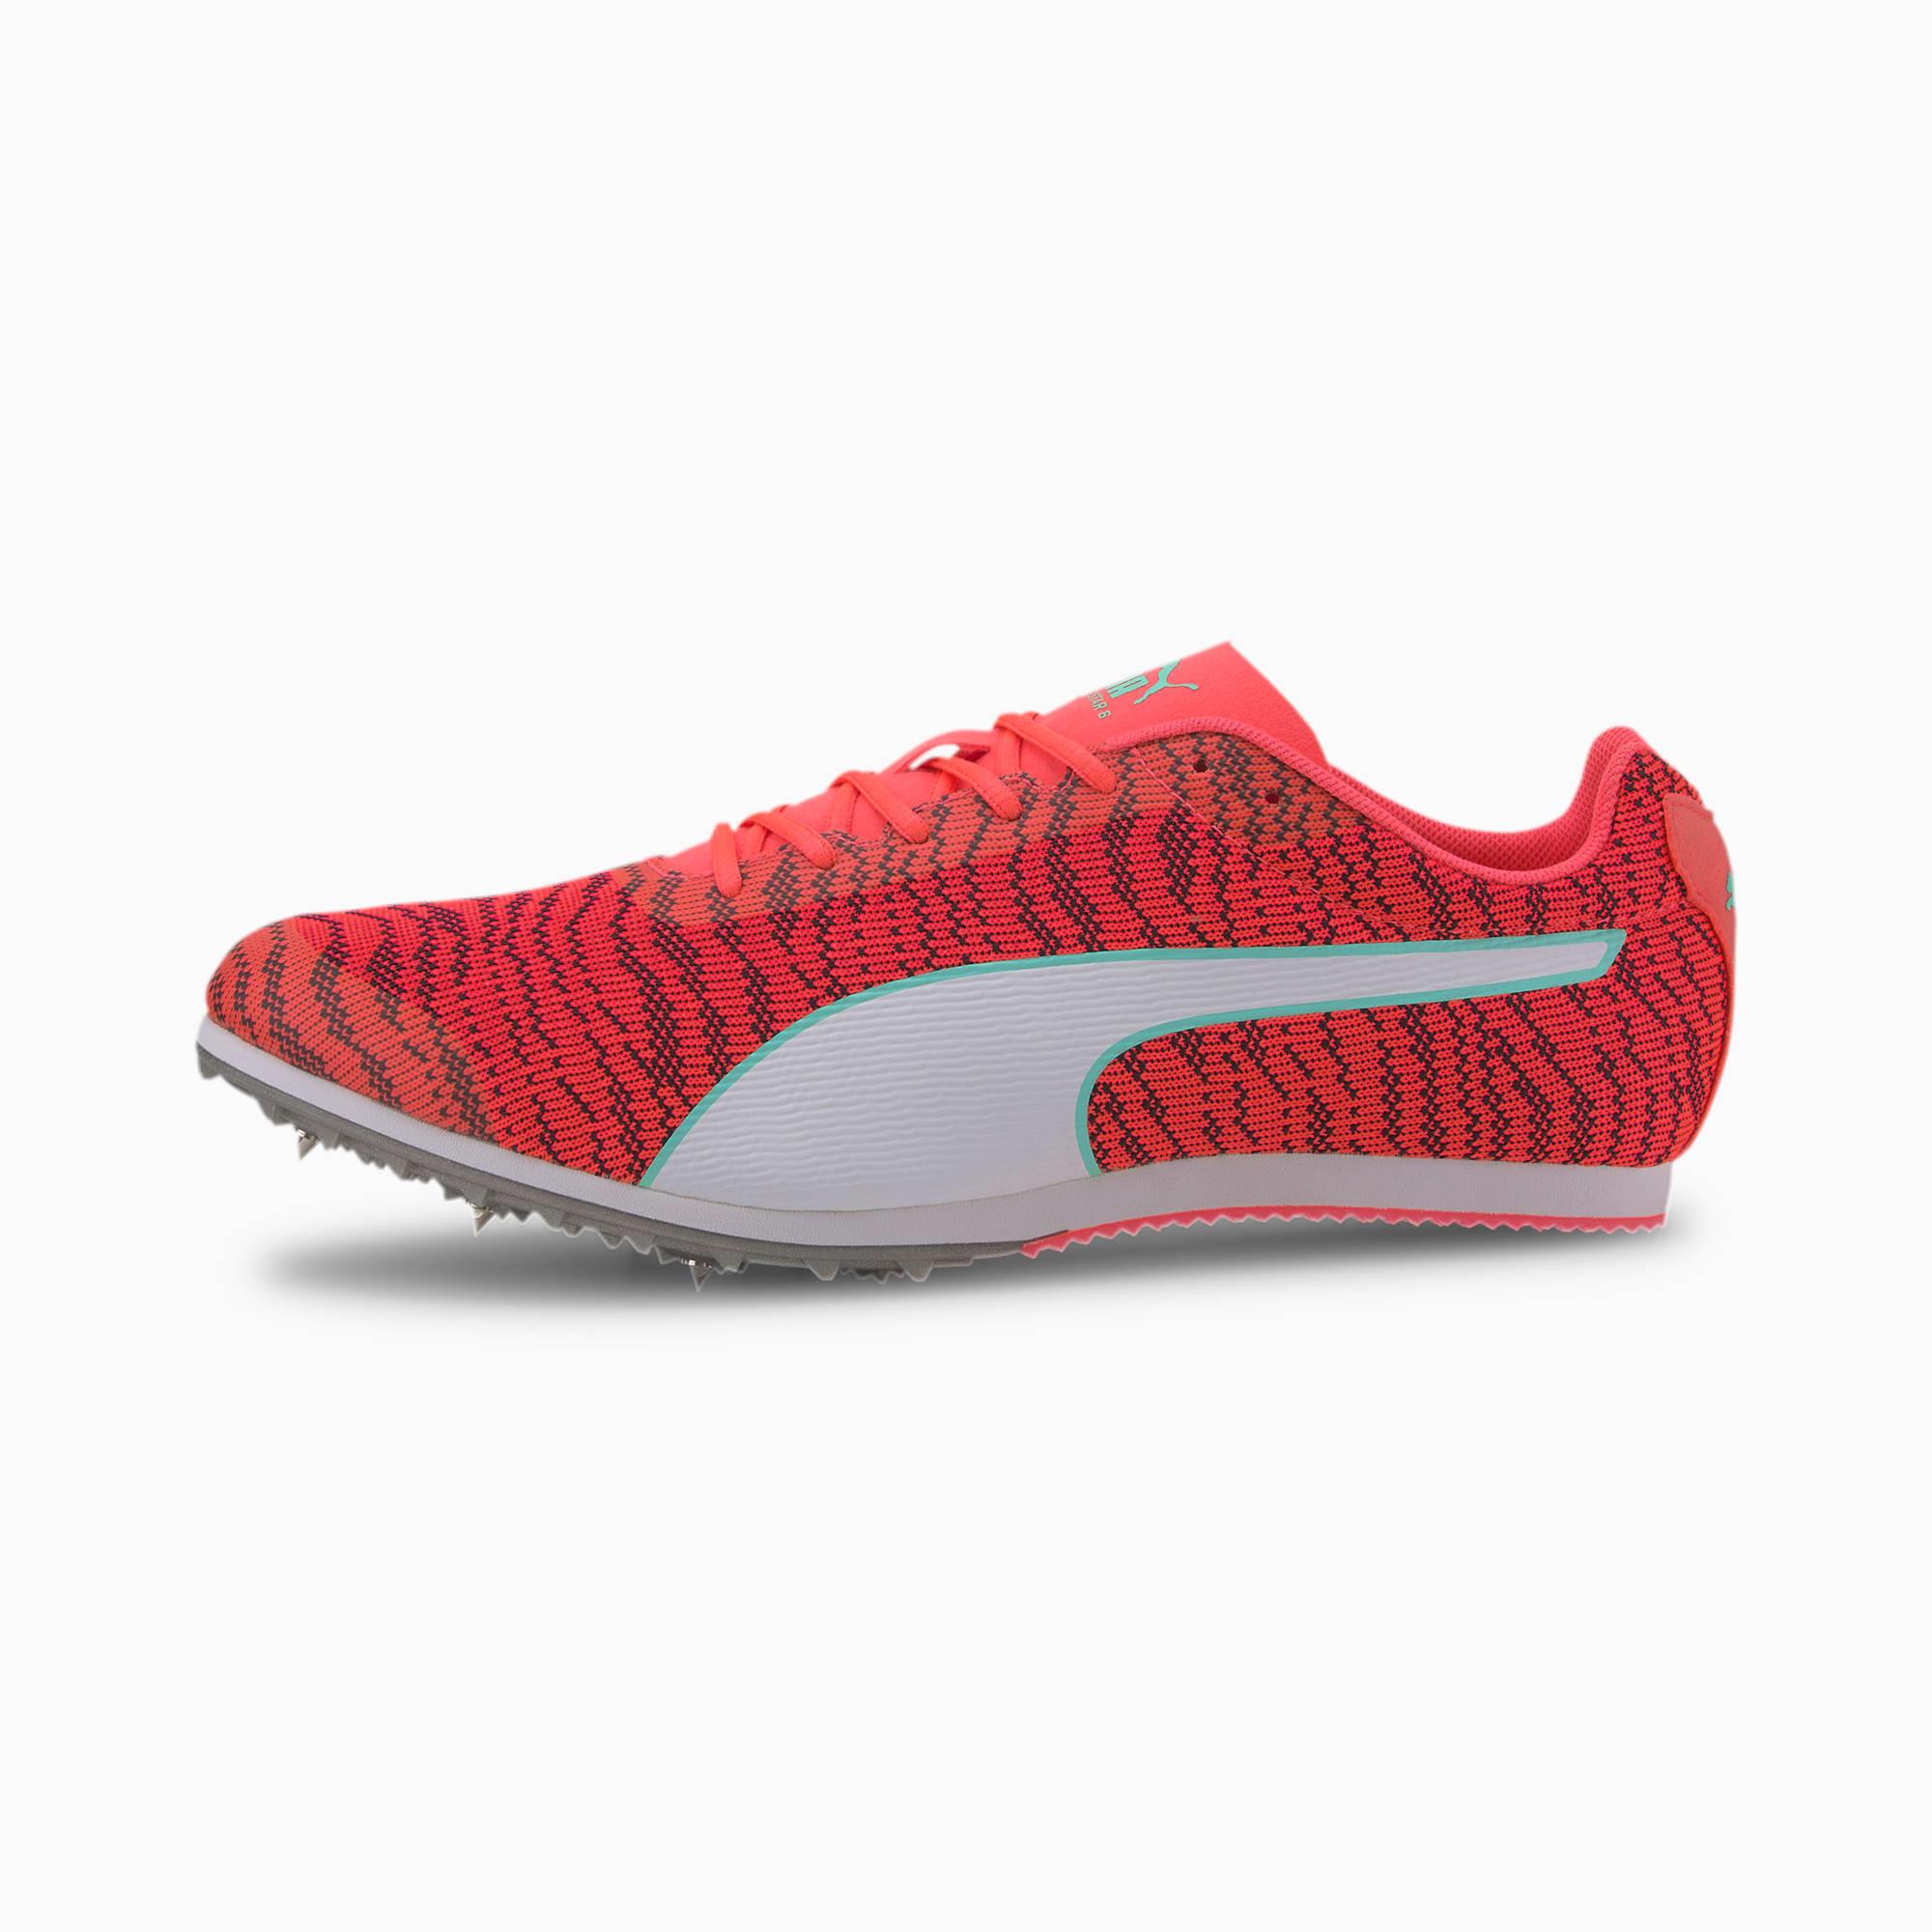 Chaussure d'athlétisme evoSPEED Star 6 pour homme